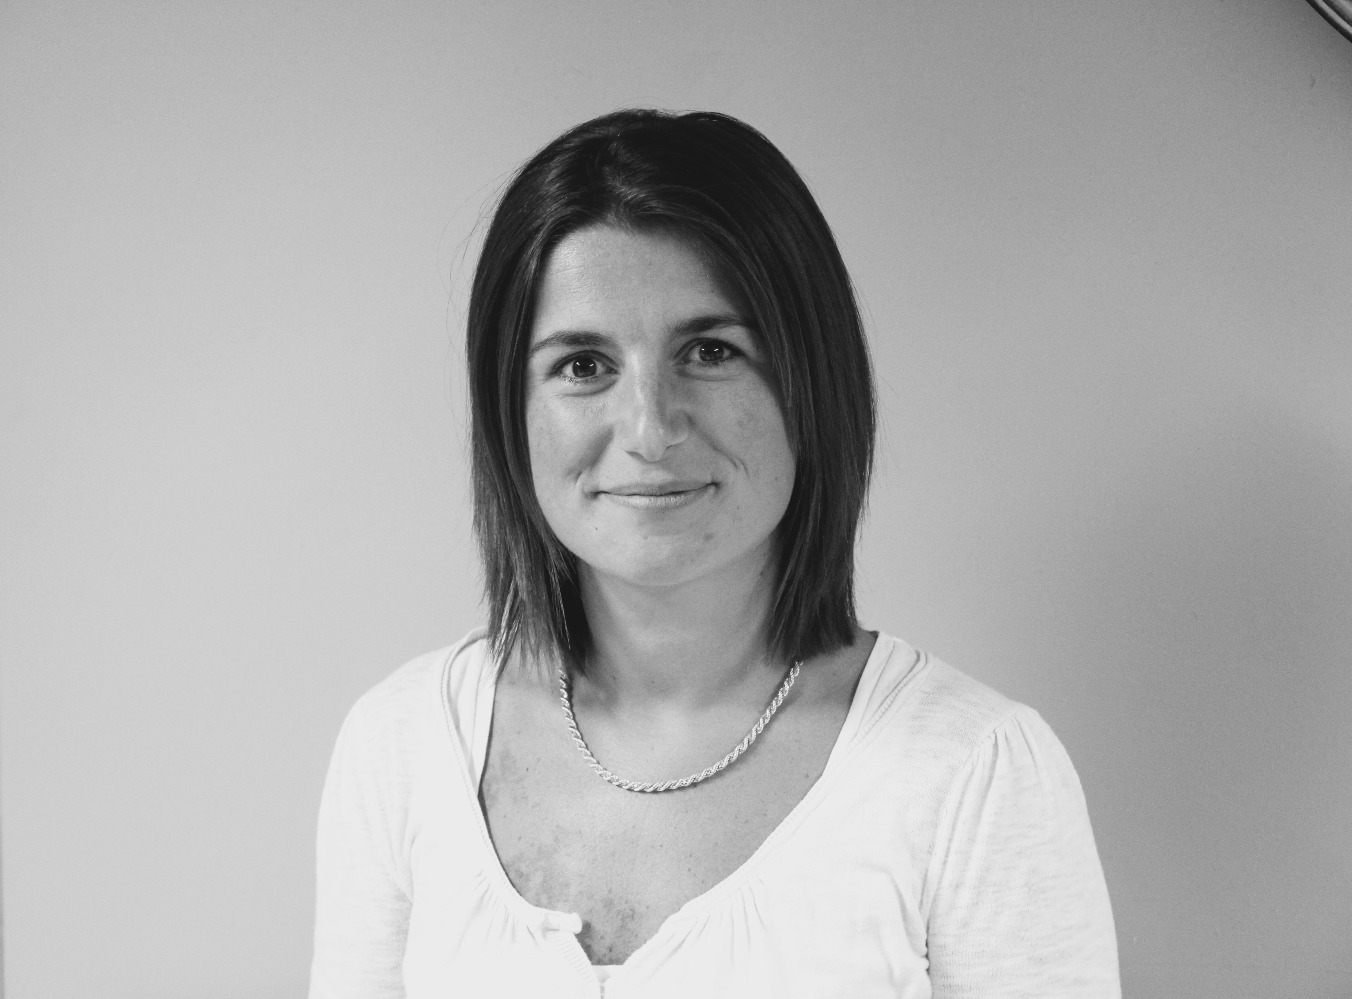 Céline Bussutil